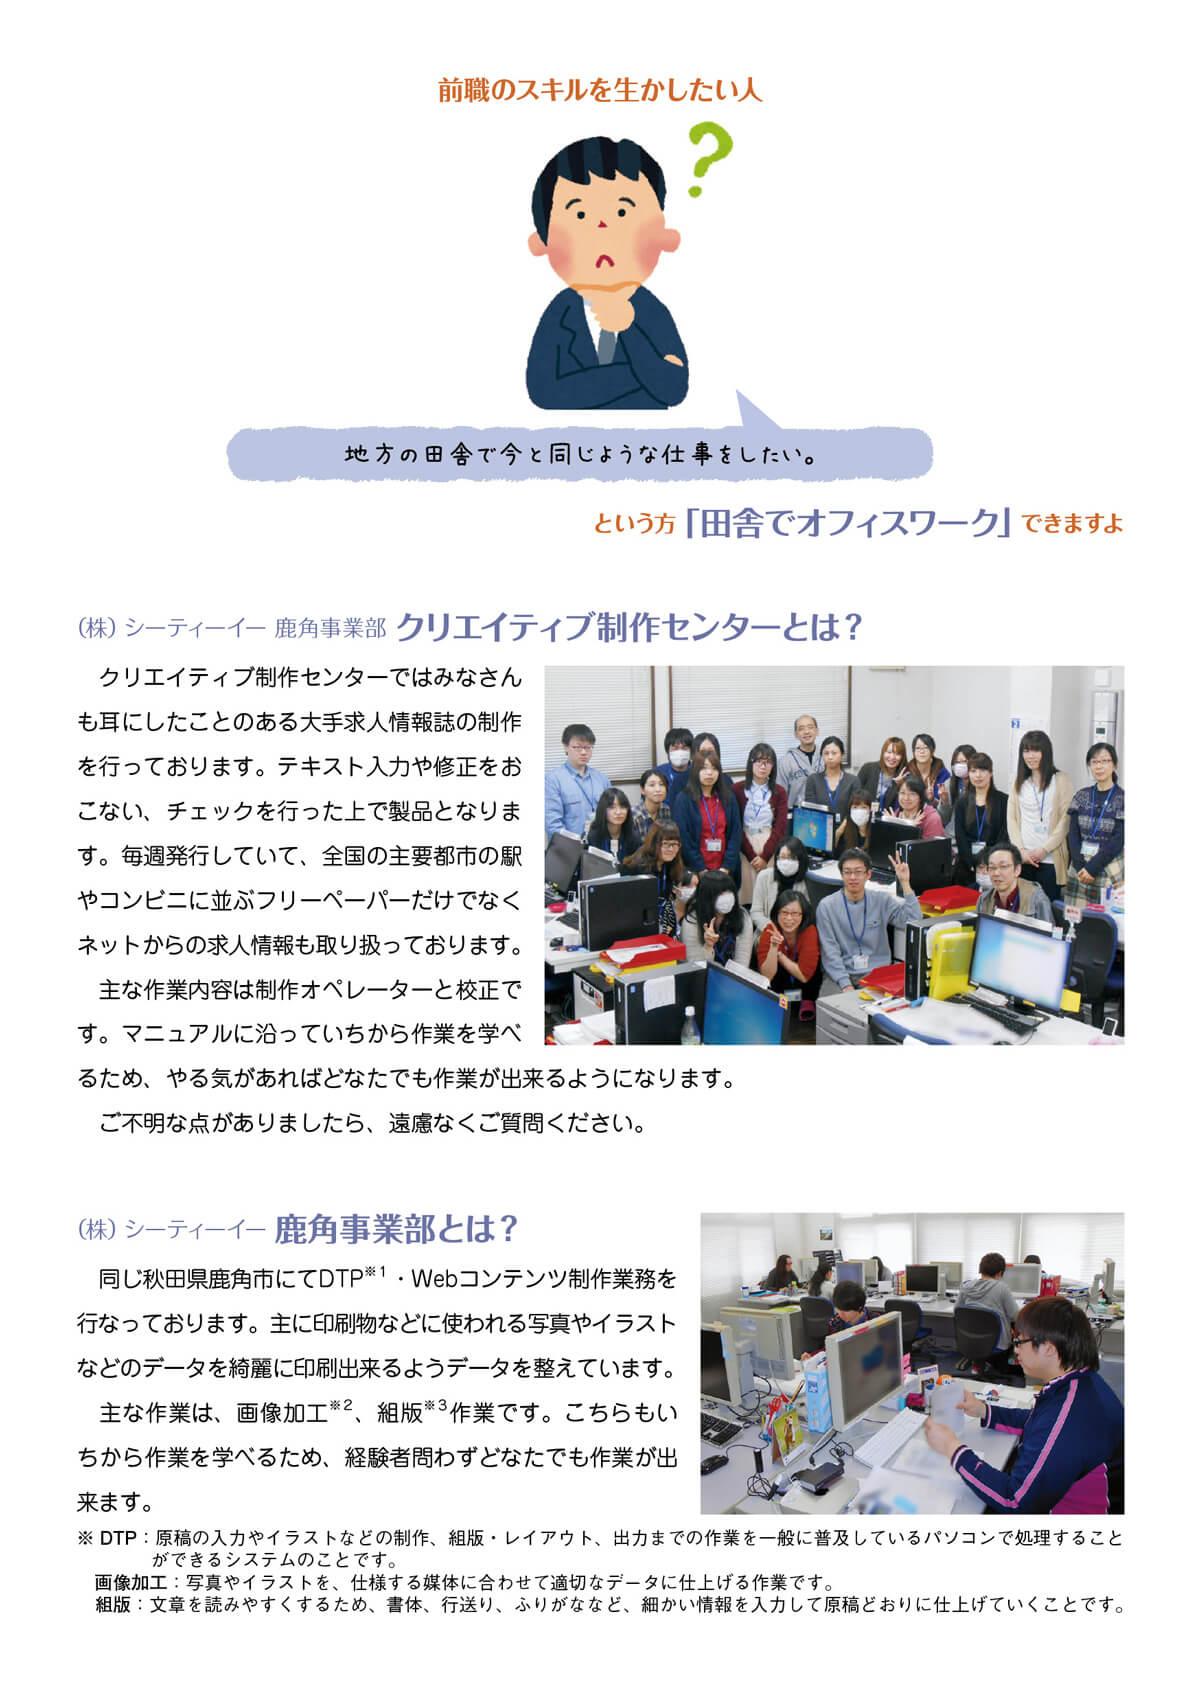 kazuno_recruit3